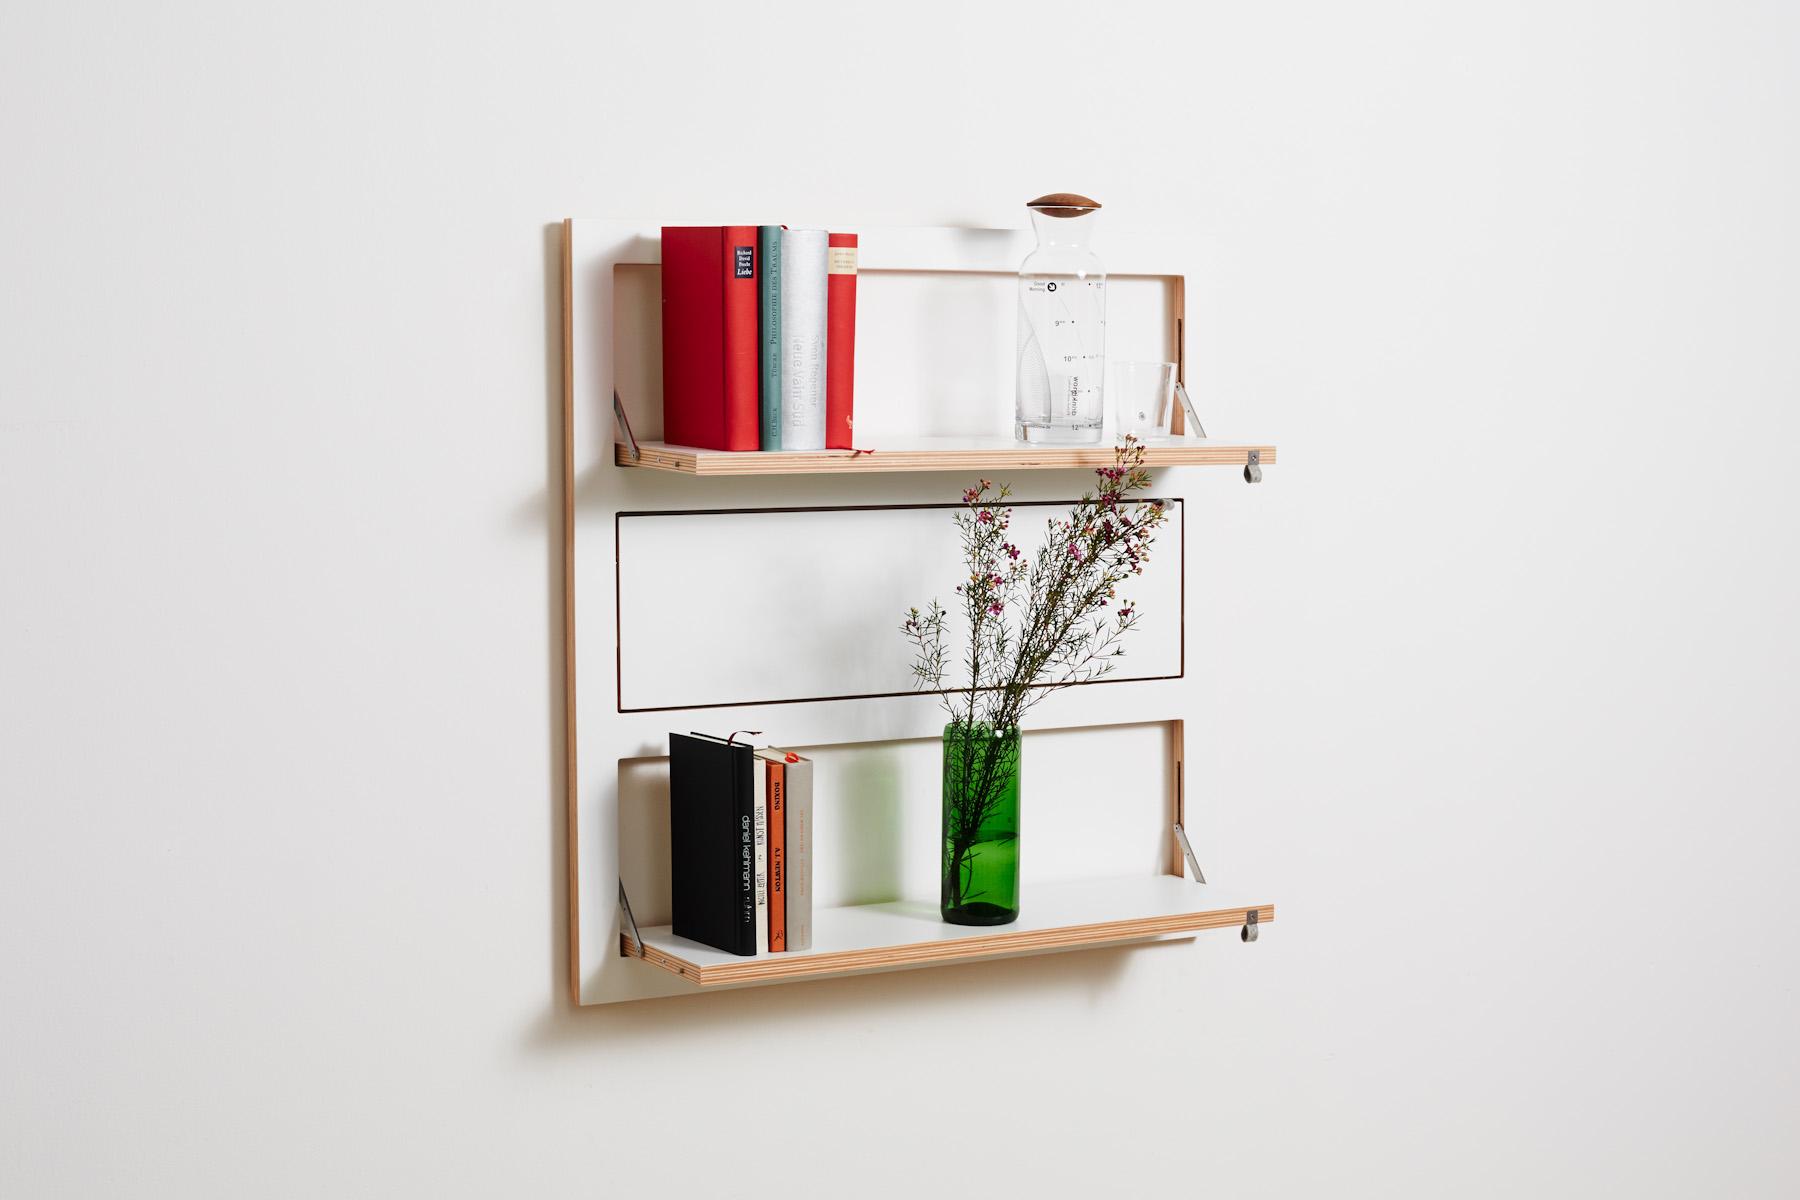 fl pps regal 80x80 3 wei. Black Bedroom Furniture Sets. Home Design Ideas